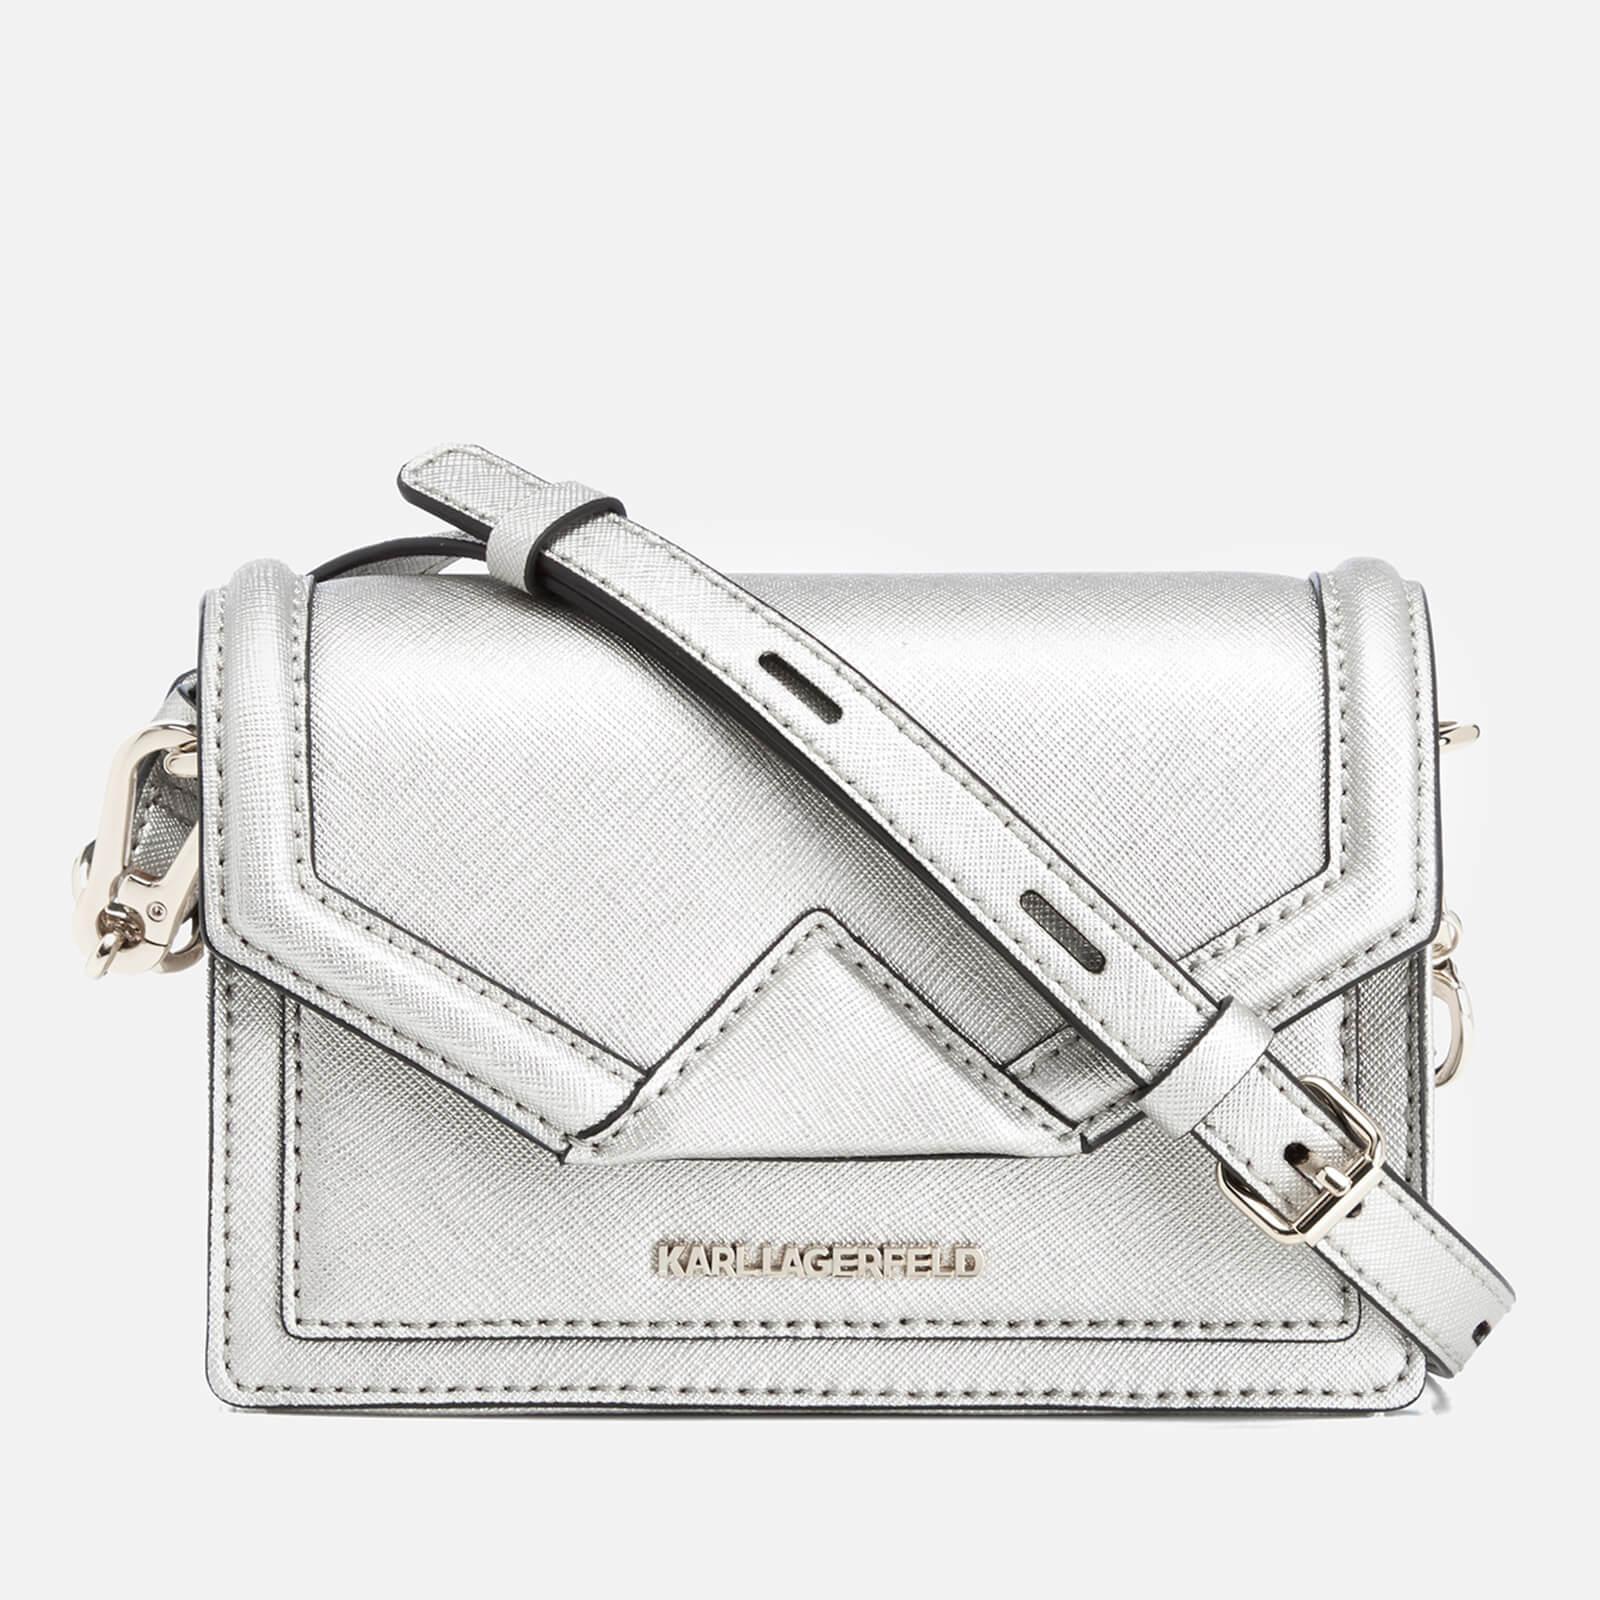 842f825f7995 Karl Lagerfeld. Women s K klassik Mini Cross Body Bag